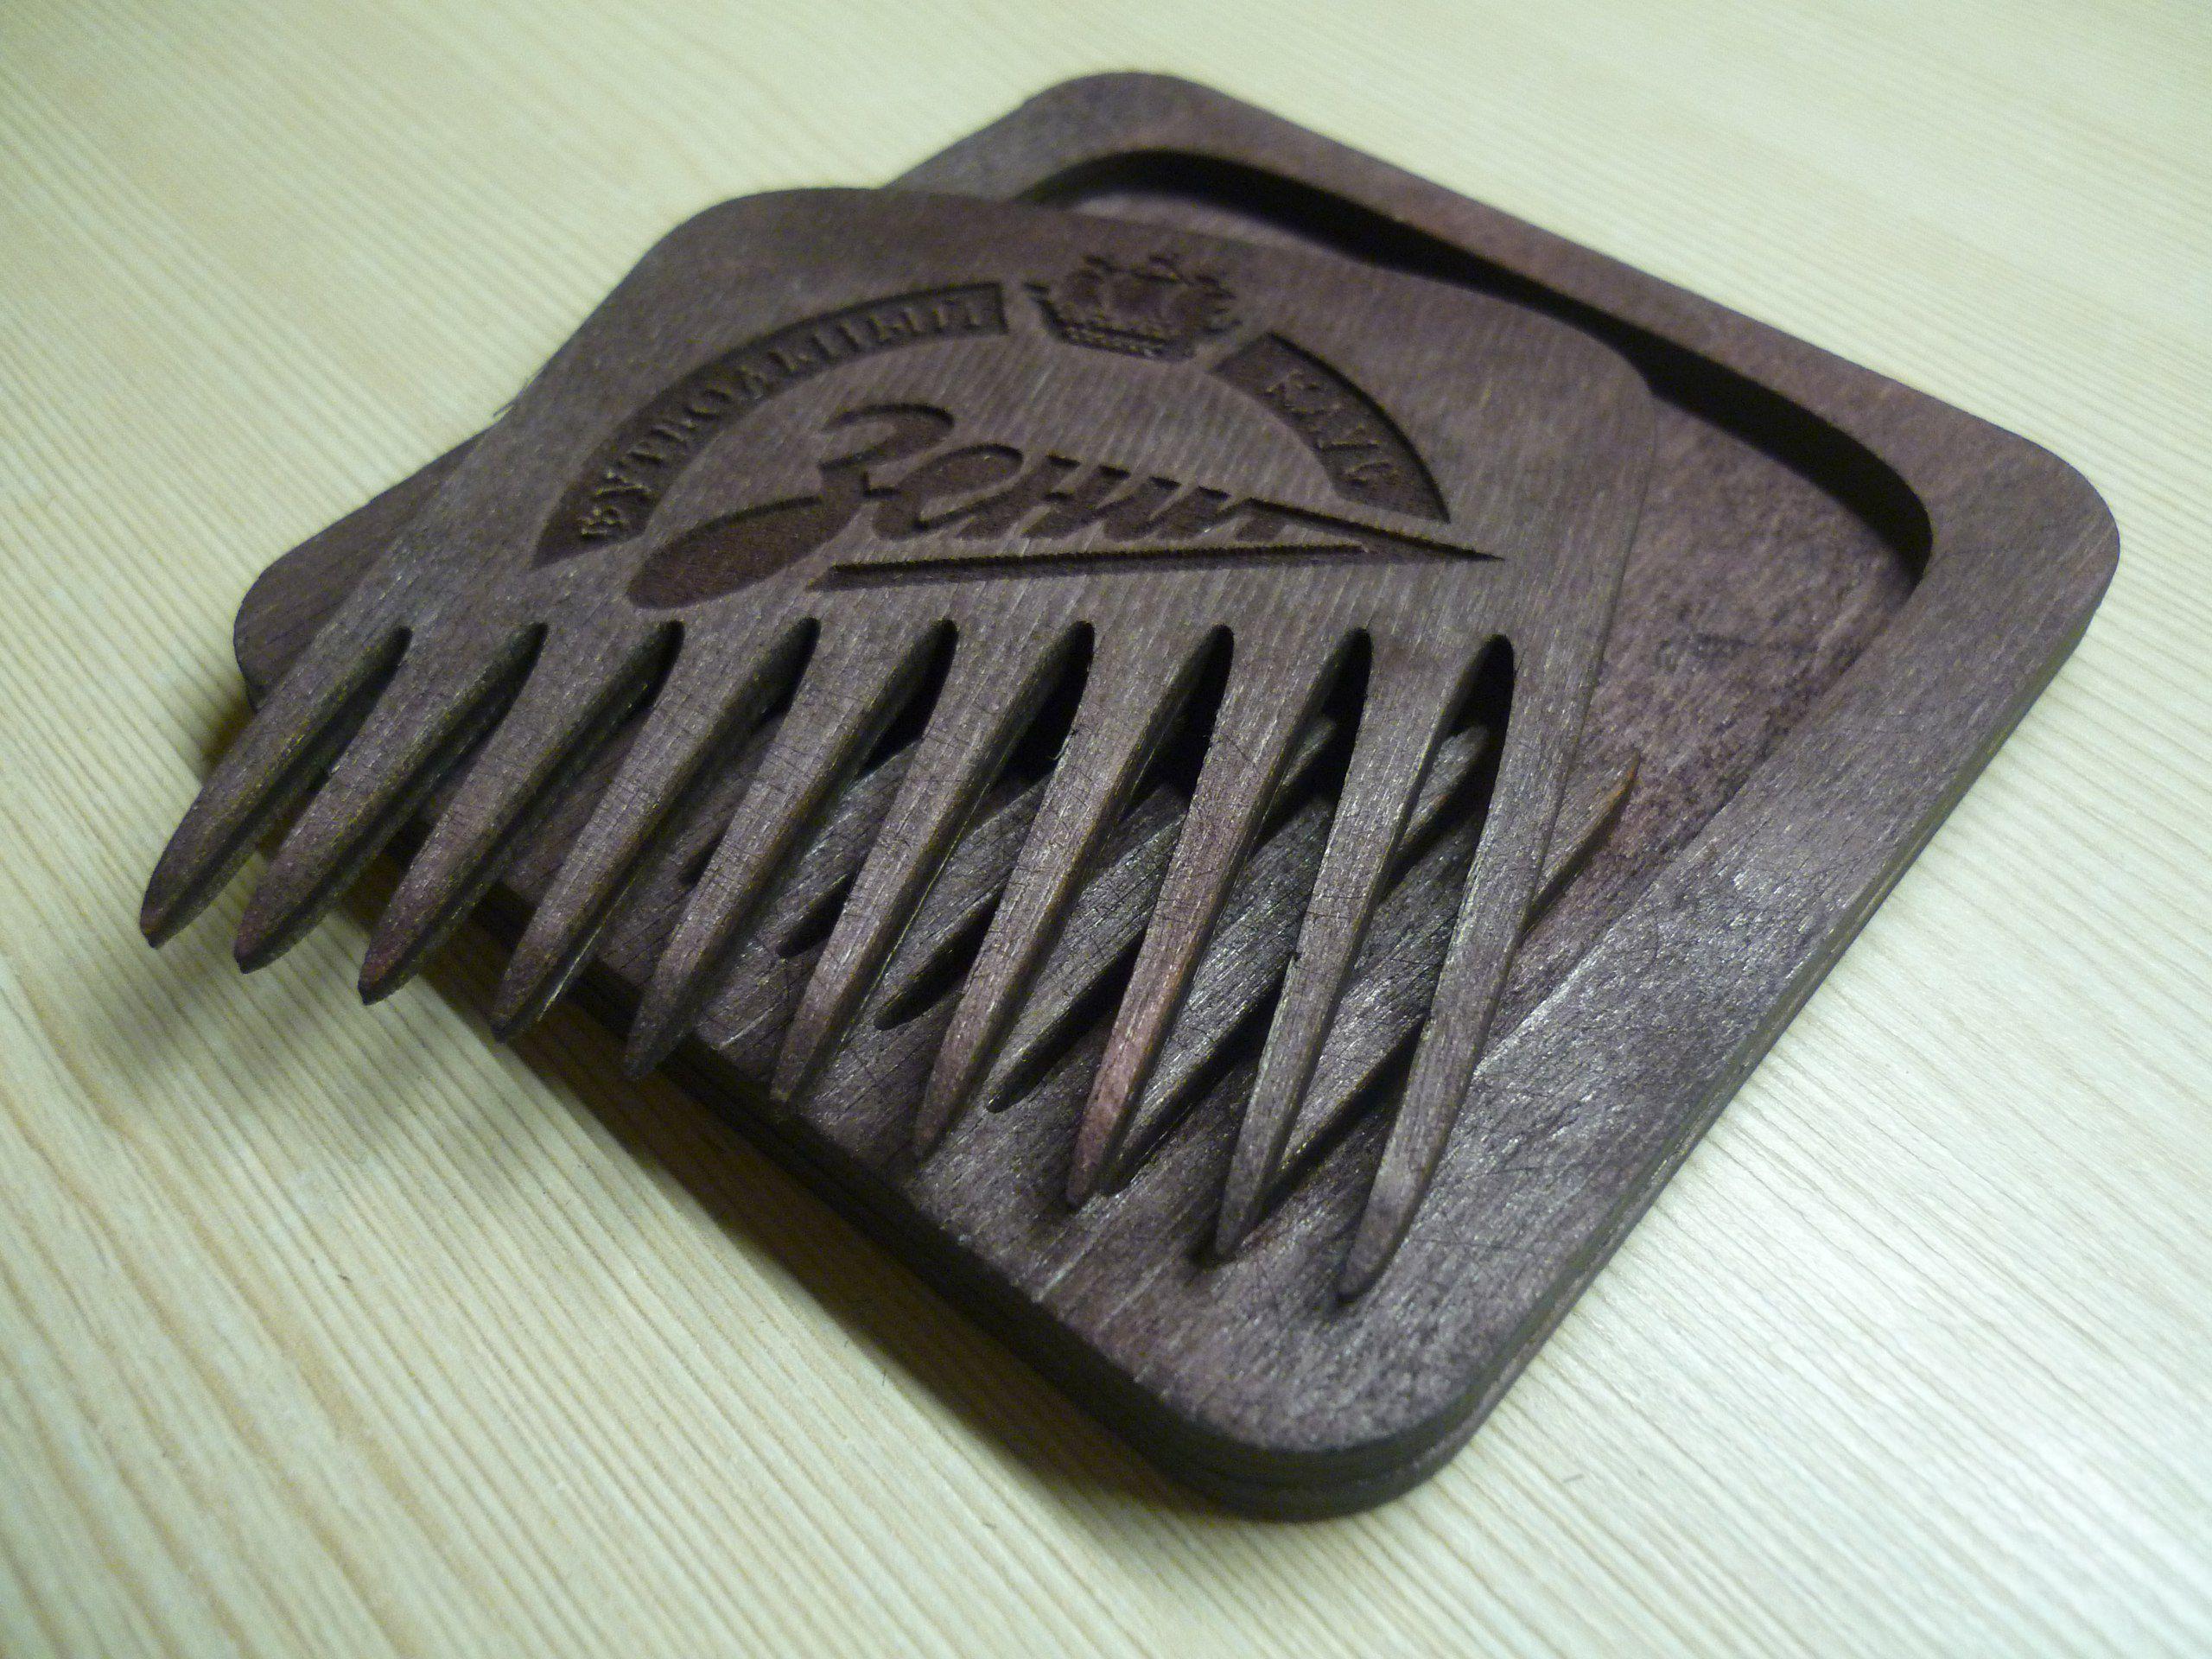 мужчинеподарок бородач бородачу гребеньдлябороды издерева гребень борода